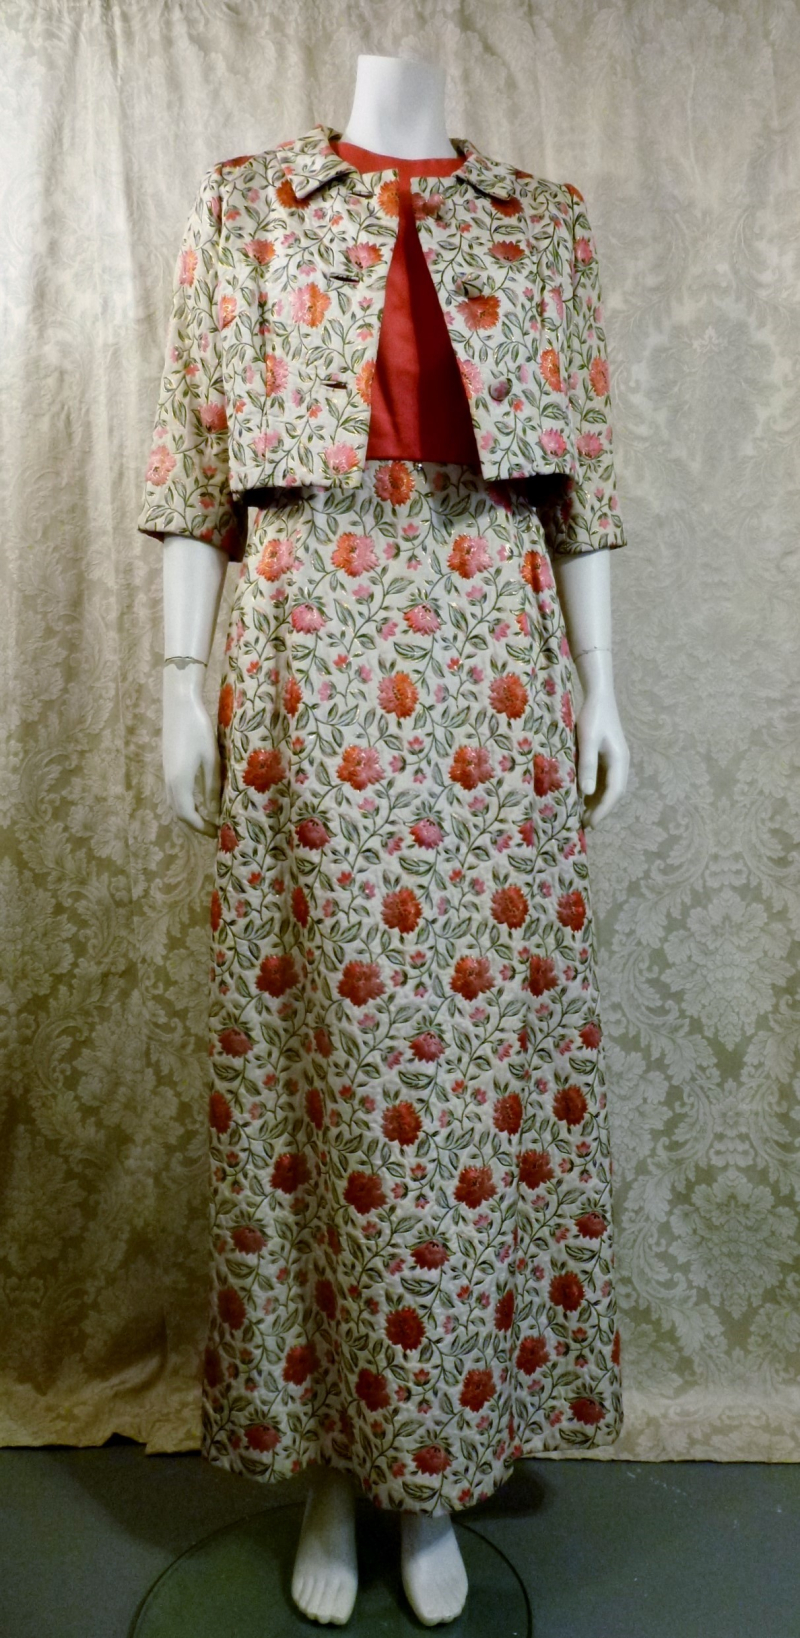 St. Regis Room Simpson's 1960s Vintage floral lame' silk damask brocade evening gown & bolero jacket (1)